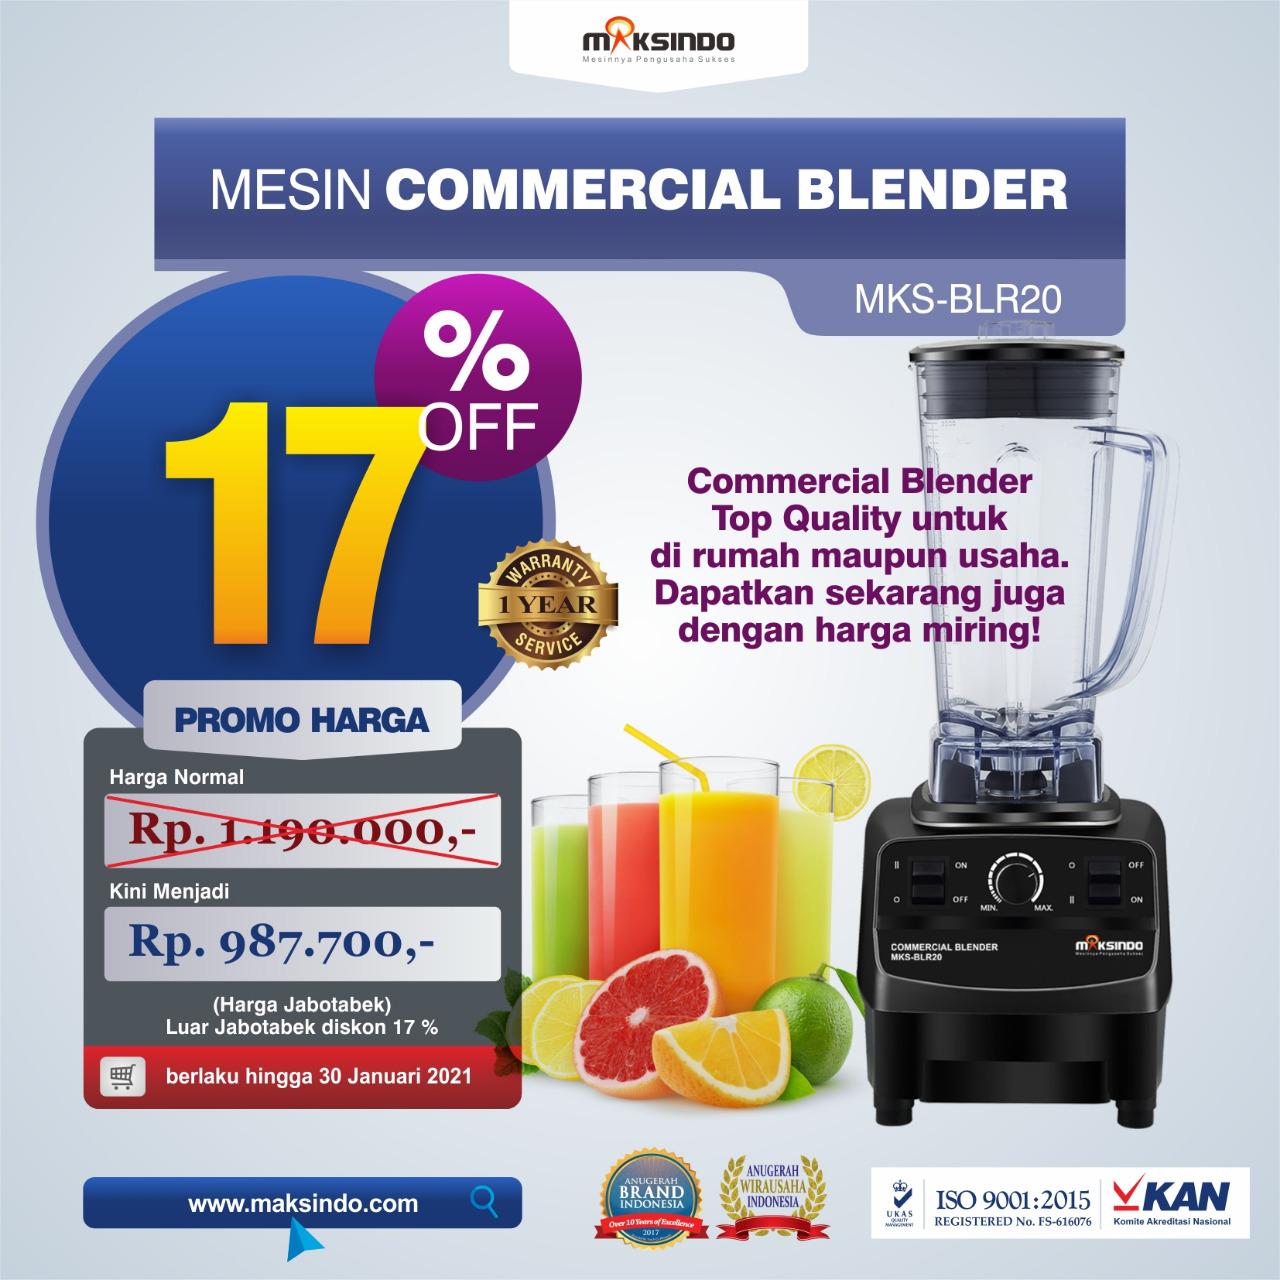 Jual Commercial BlenderMKS-BLR20 di Solo